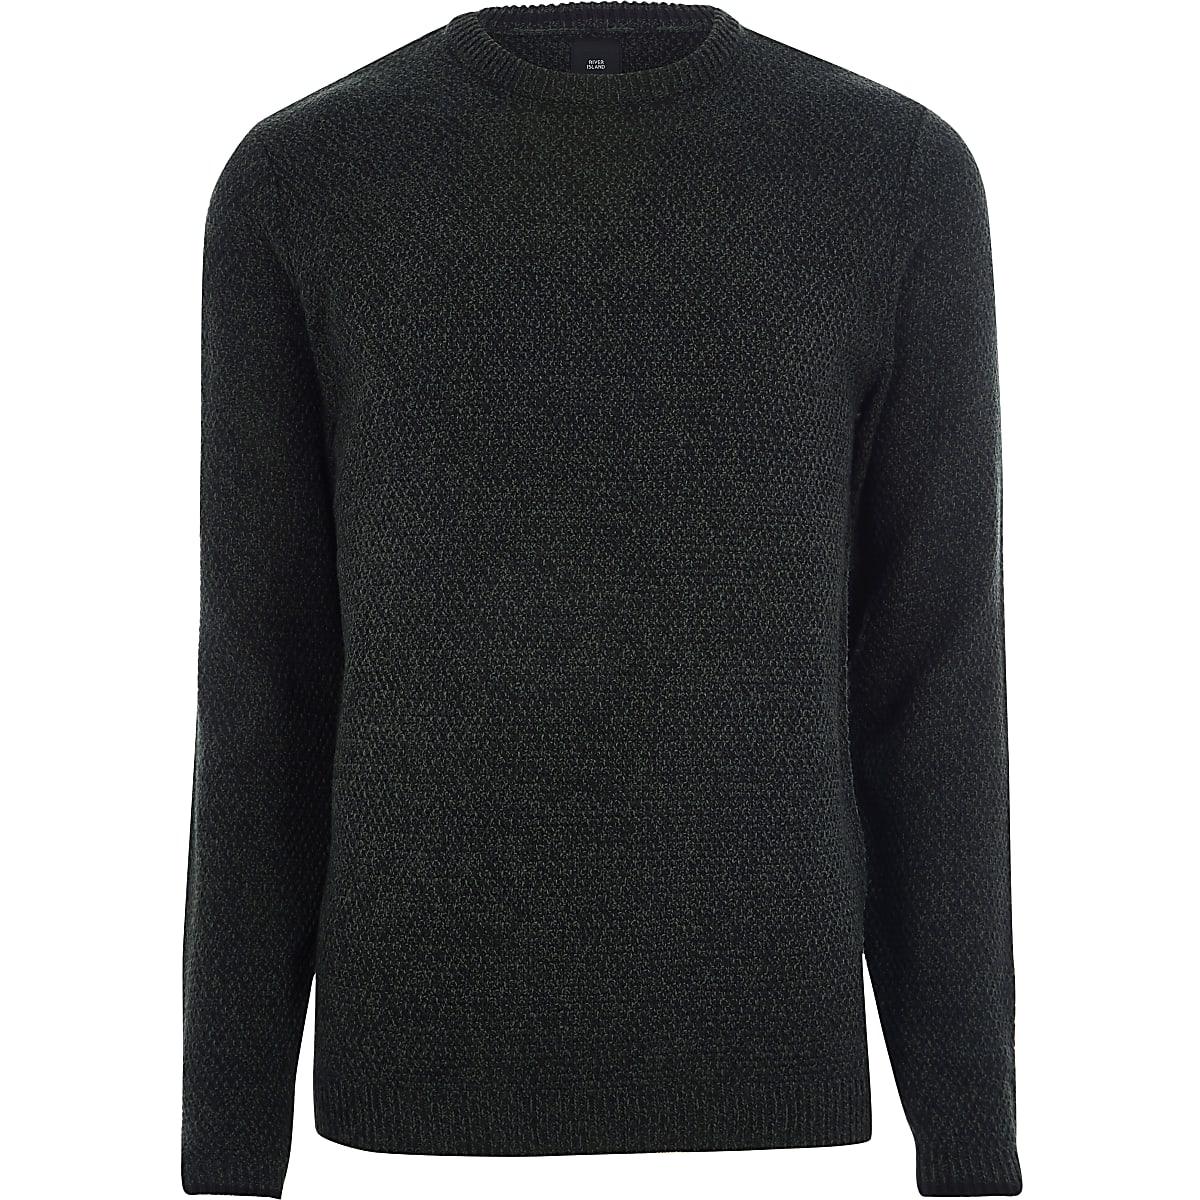 Green textured knit slim fit crew neck sweater